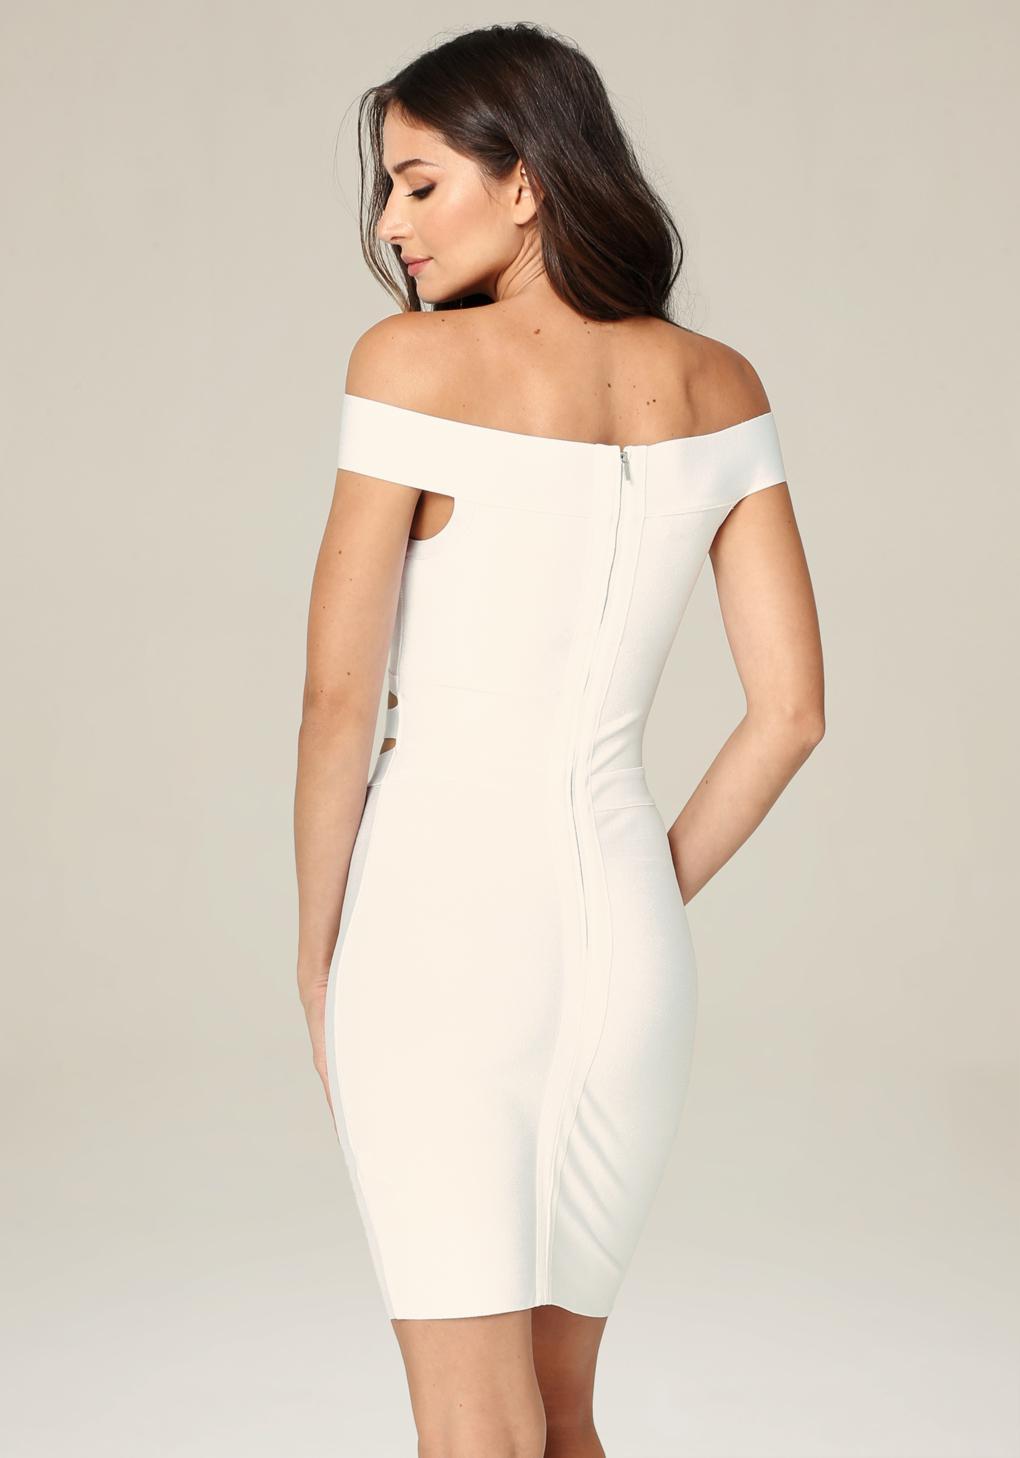 49e940b06e0 Bebe Off Shoulder Cutout Dress in White - Lyst